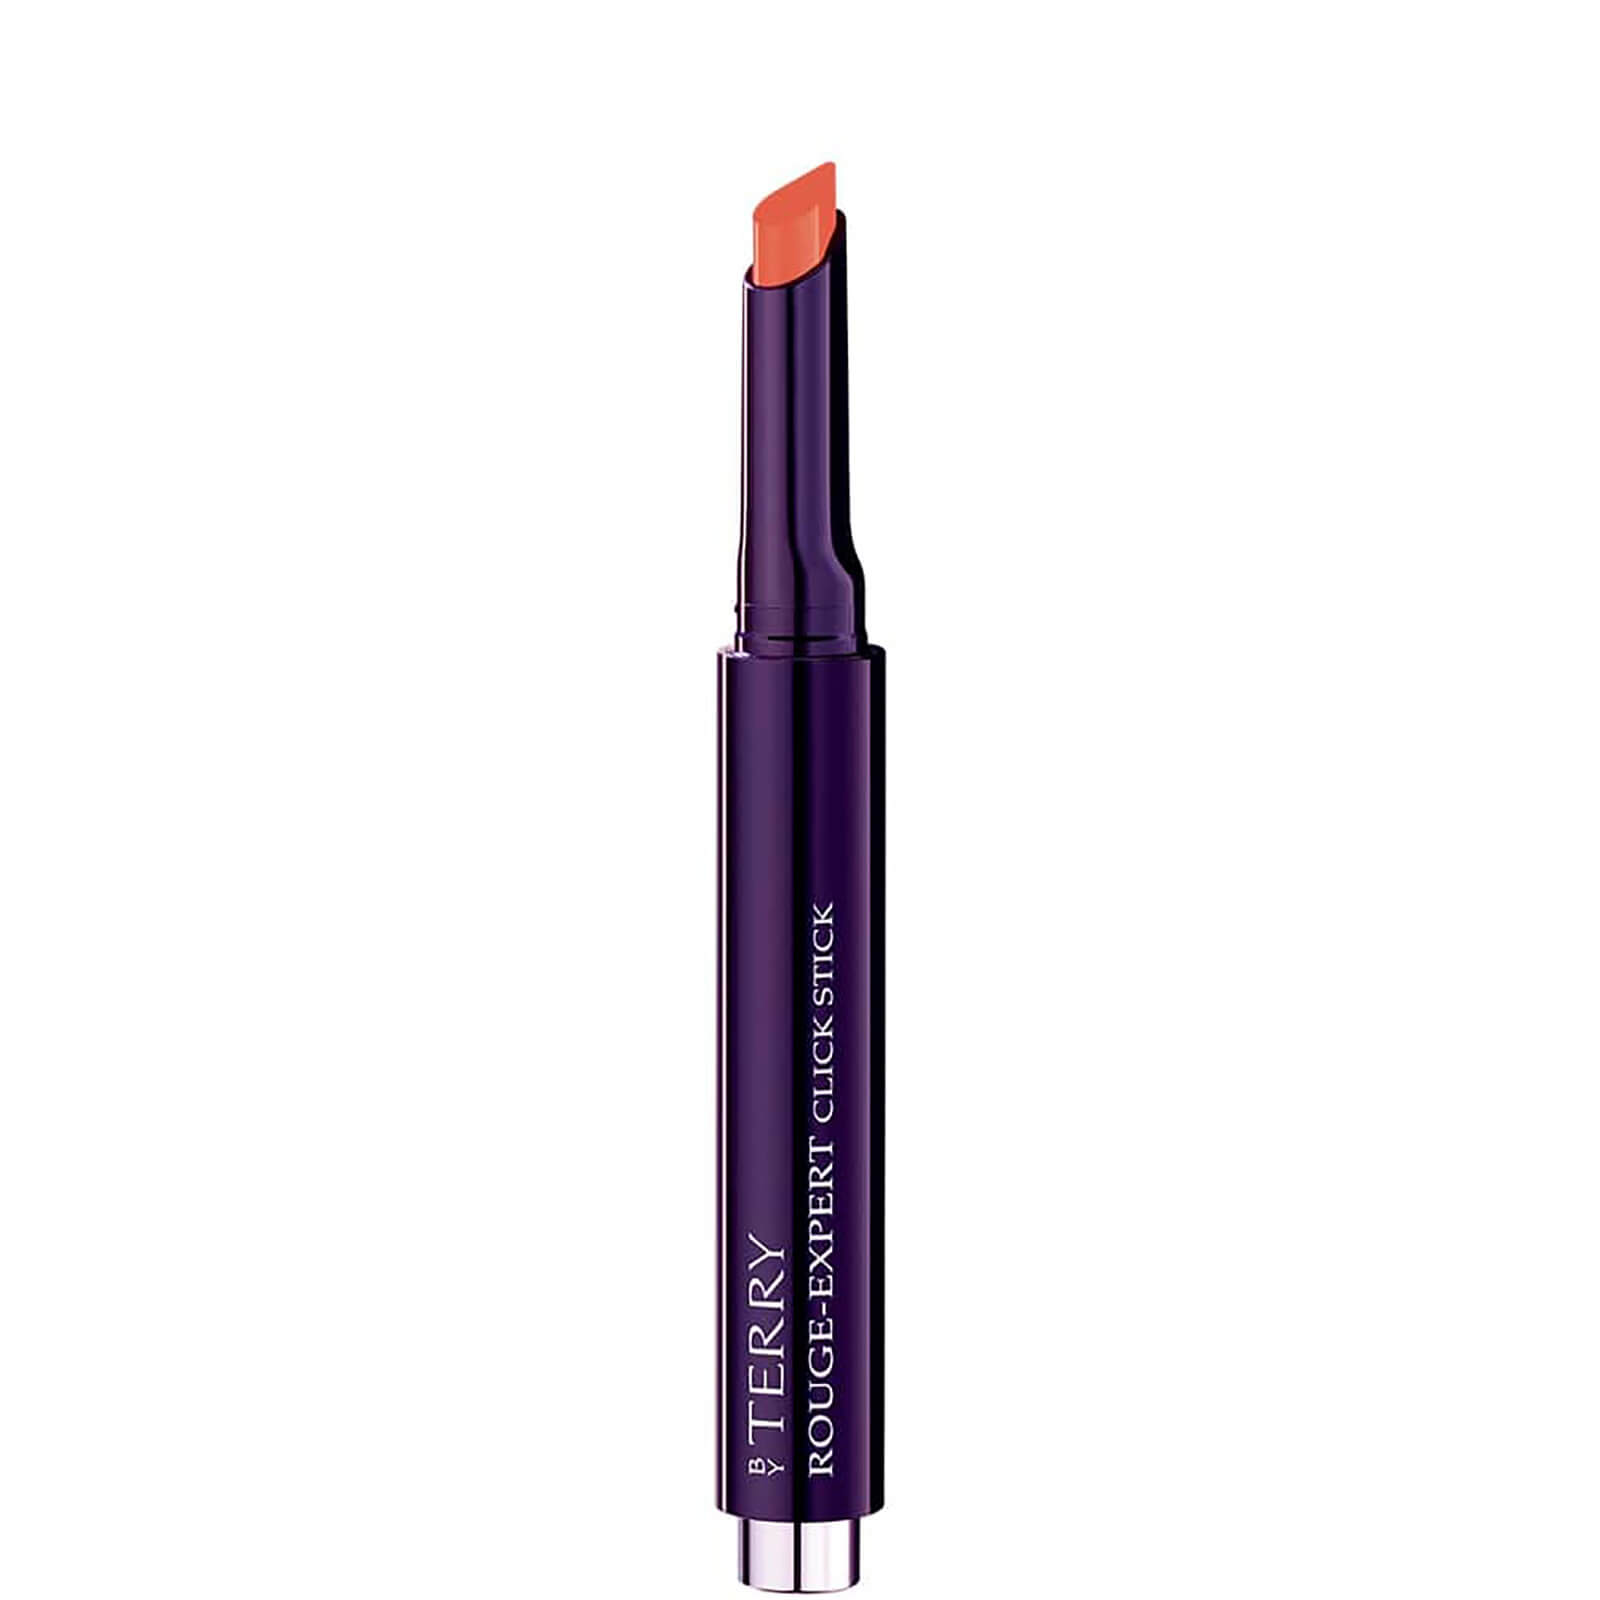 Купить Губная помада By Terry Rouge-Expert Click Stick Lipstick 1, 5 г (различные оттенки) - Naked Nectar